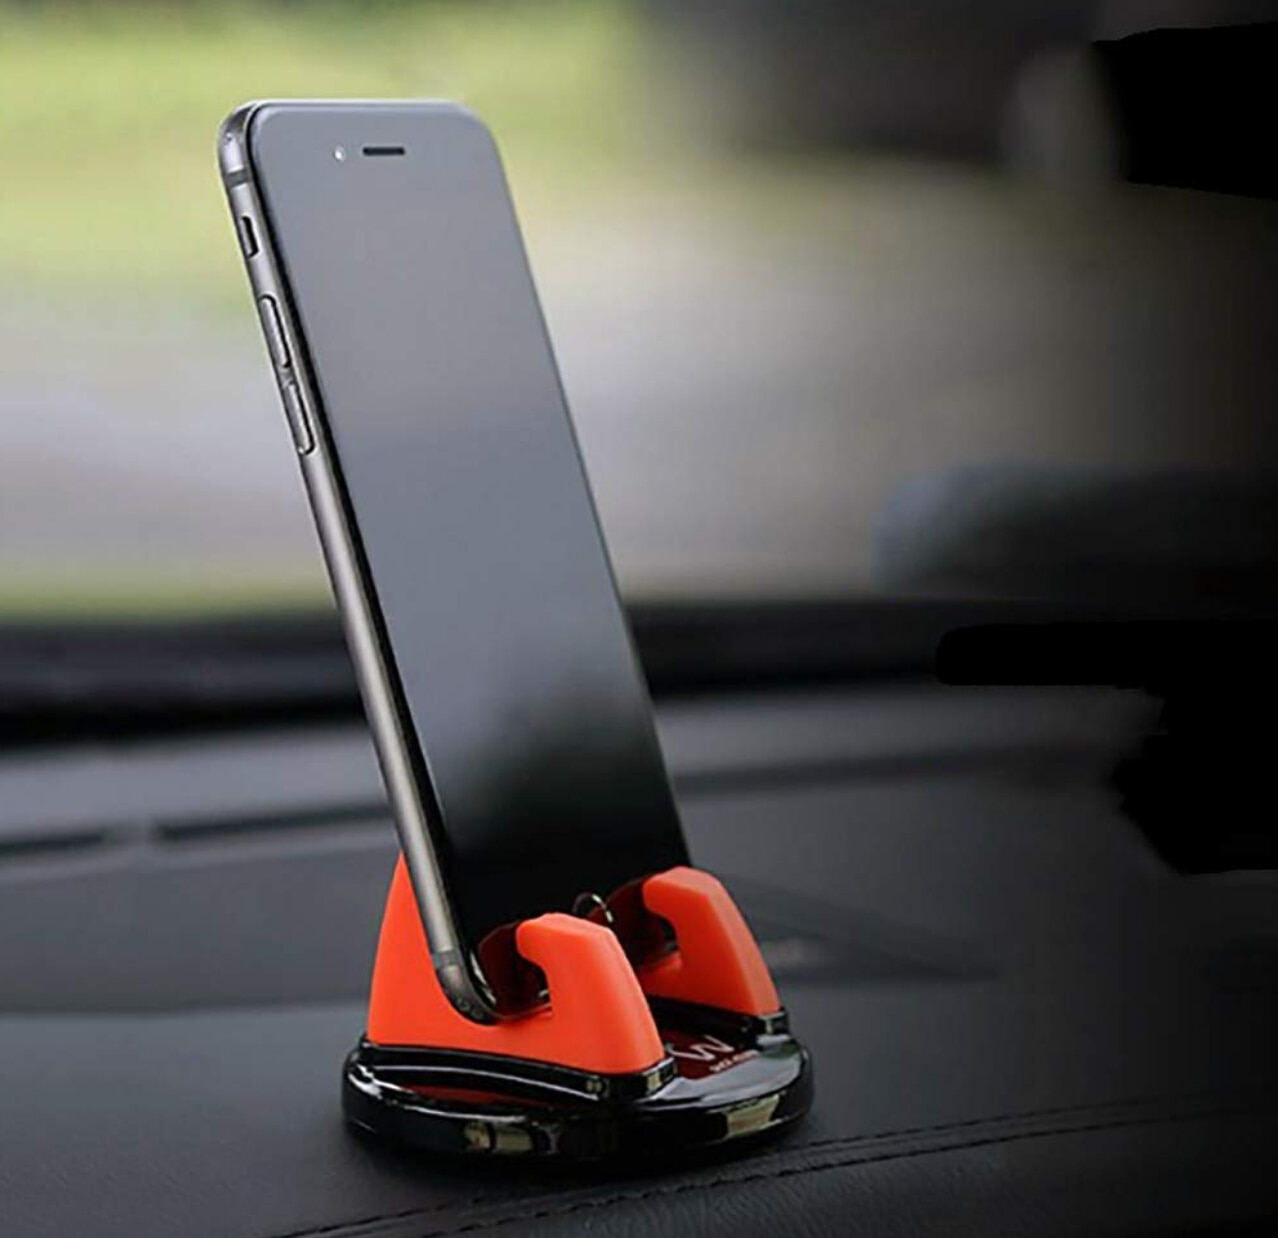 Soporte de teléfono Universal para ornamento de coche para chevrolet cruze 2010, ford s-max, nissan qashqai j10, ford fiesta, audi a4